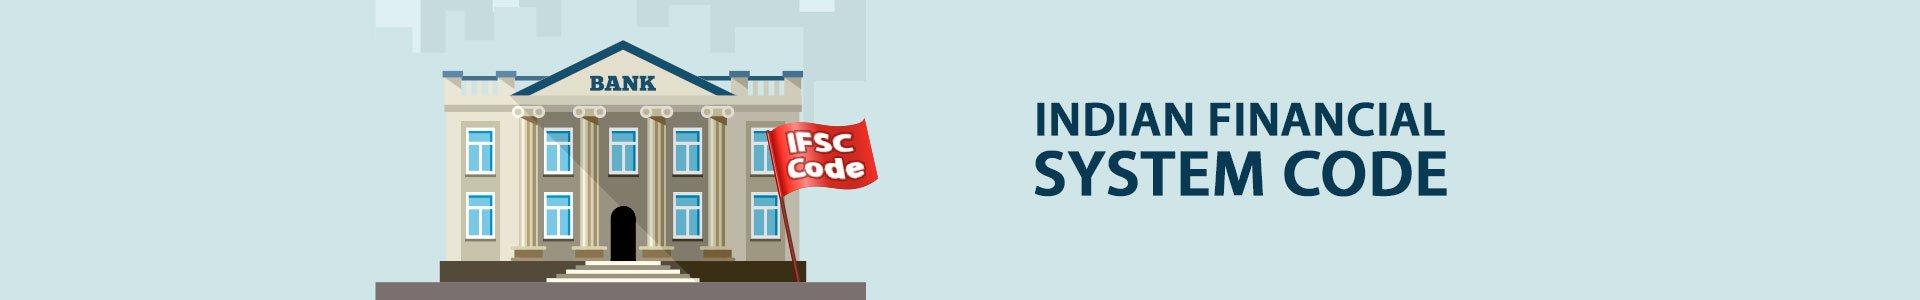 ifsc-code-banner